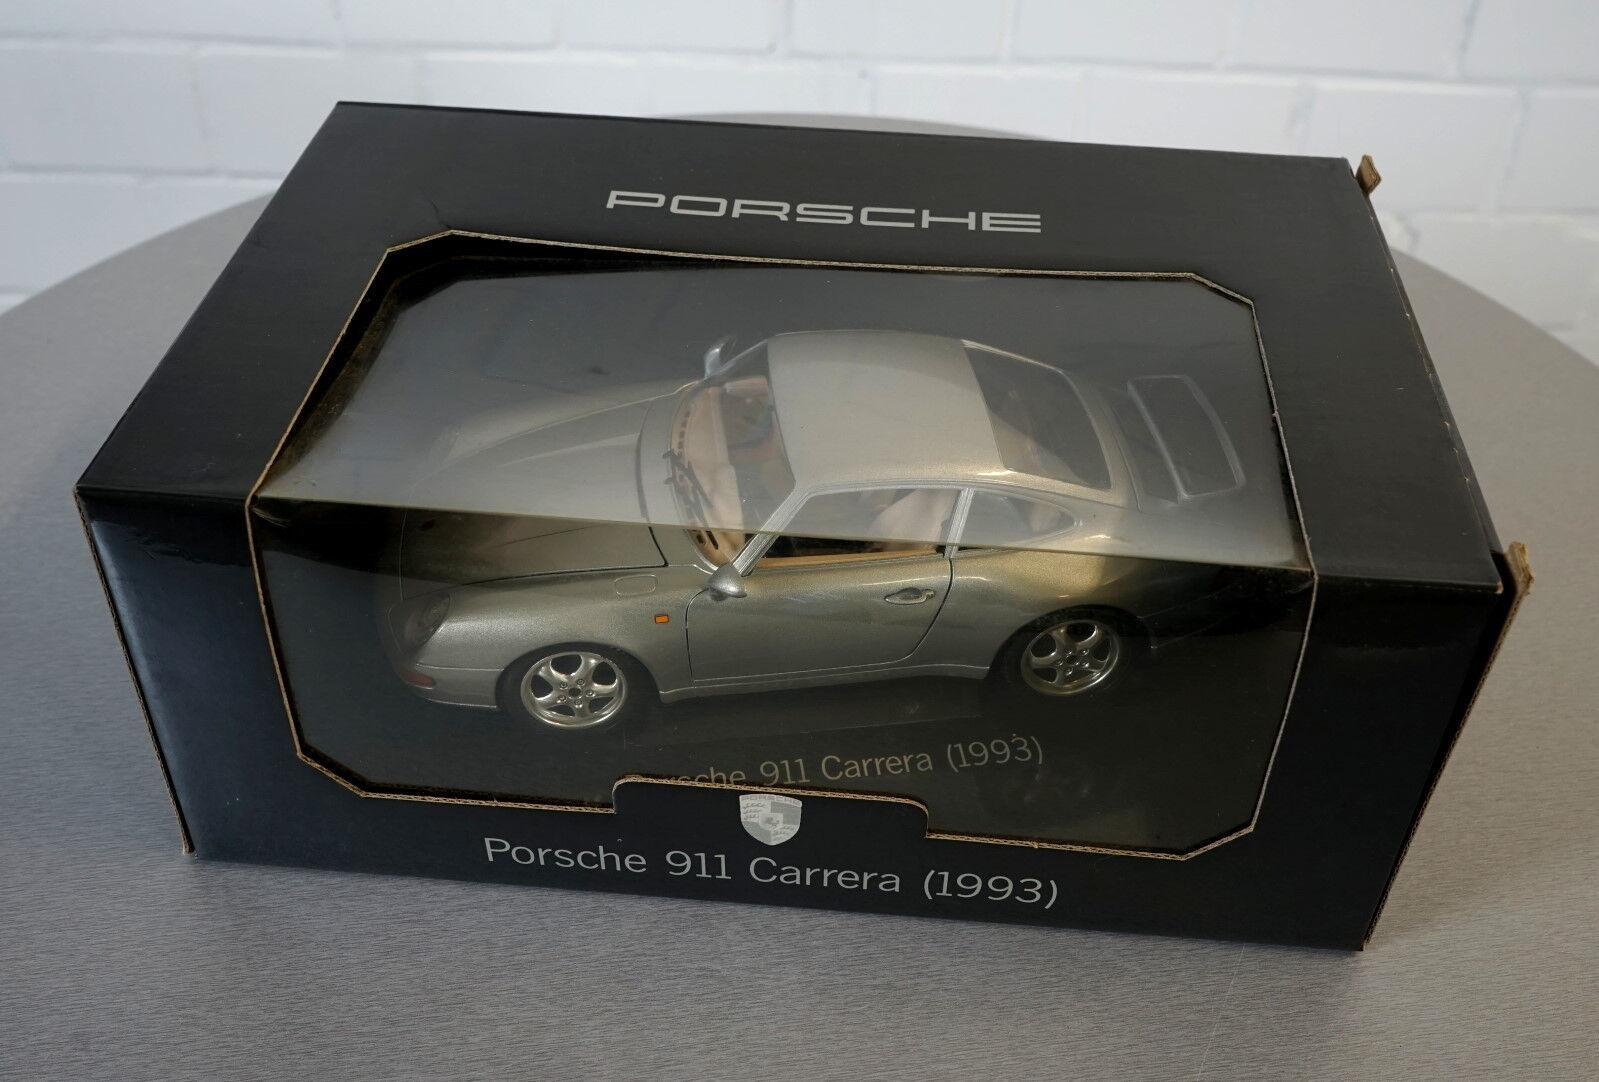 BURAGO PORSCHE 911 Carrera (1993) argent P.O. Box 11-0040 - Scale Modèle Voiture Neuf dans sa boîte